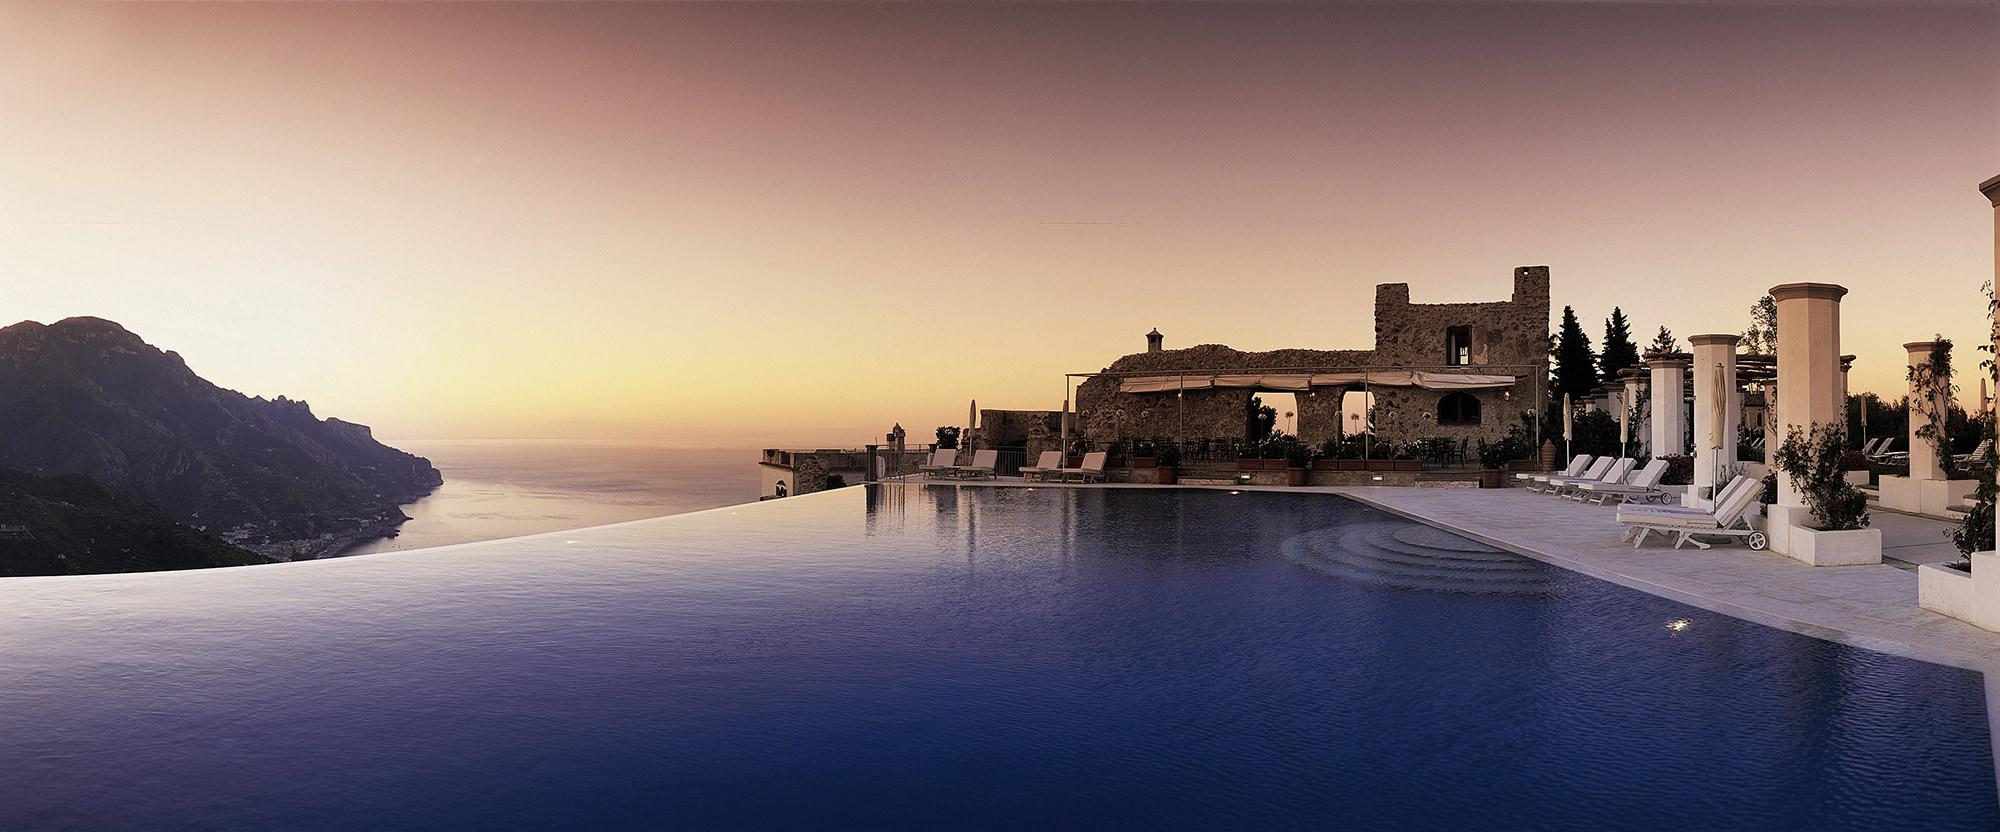 Hotel Caruso Wedding Ravello Amalfi Coast Italy